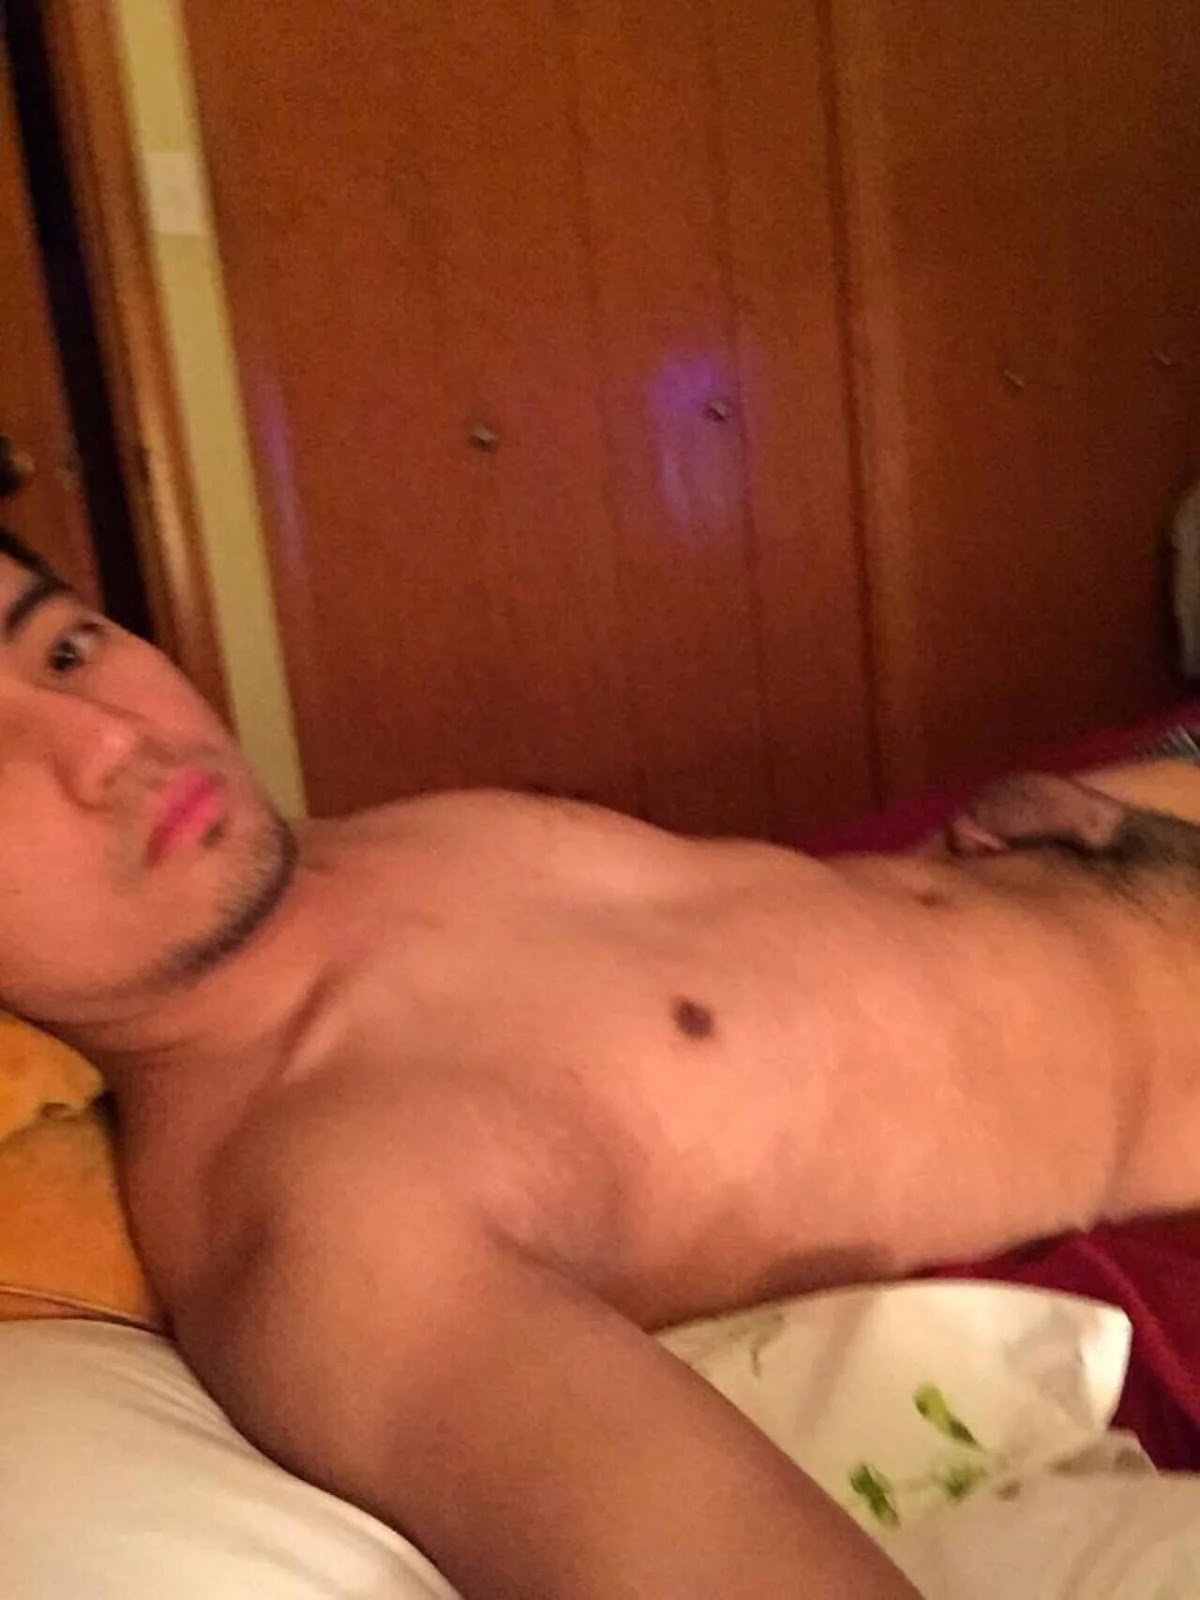 pinoy gay chat